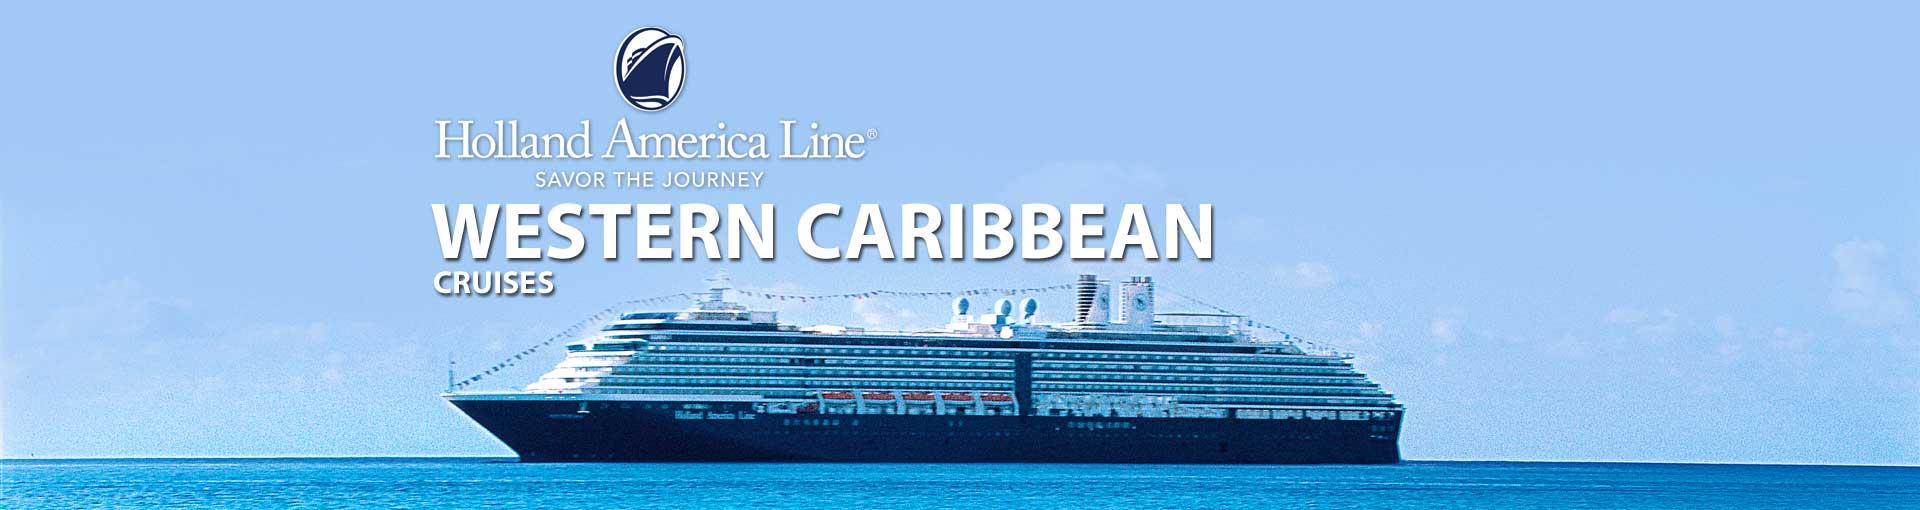 Holland America Western Caribbean Cruises